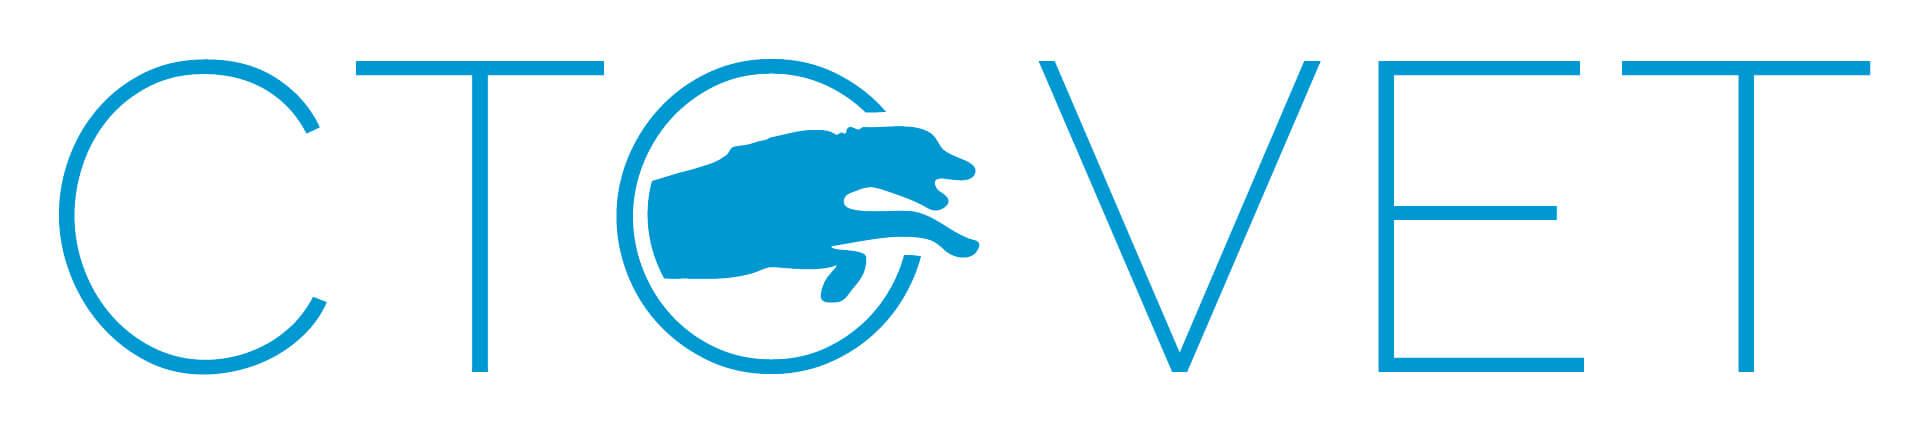 CTOVET-logo-ufficiale-2017